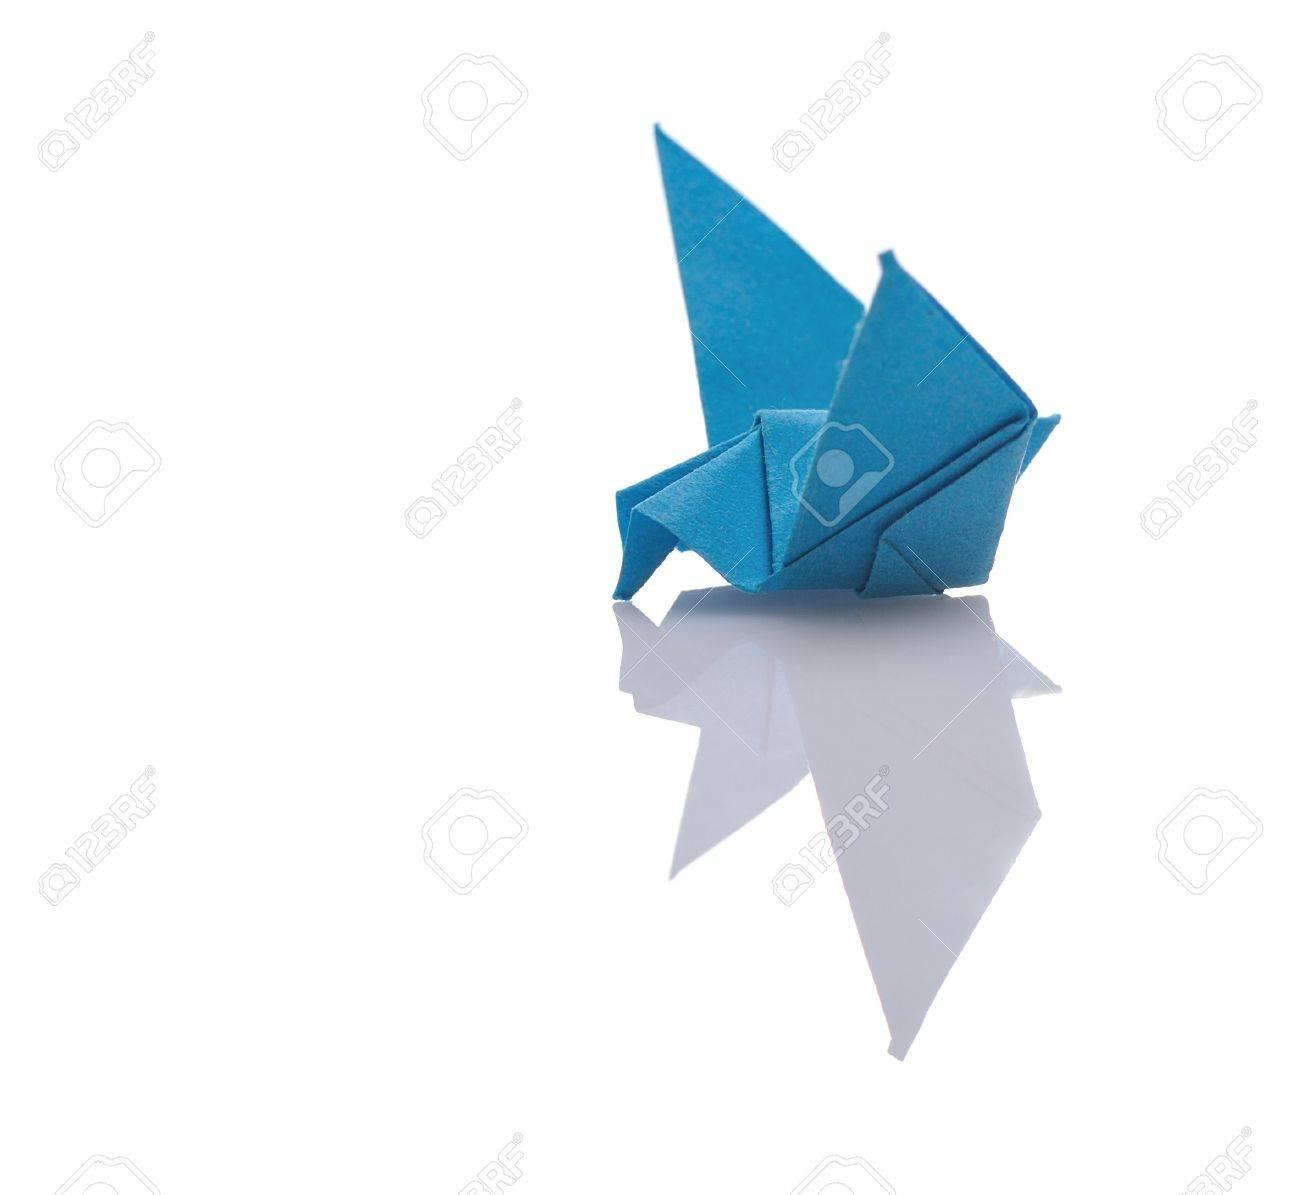 Colorful Tiny Stuff Of Origami On White Background Stock Photo